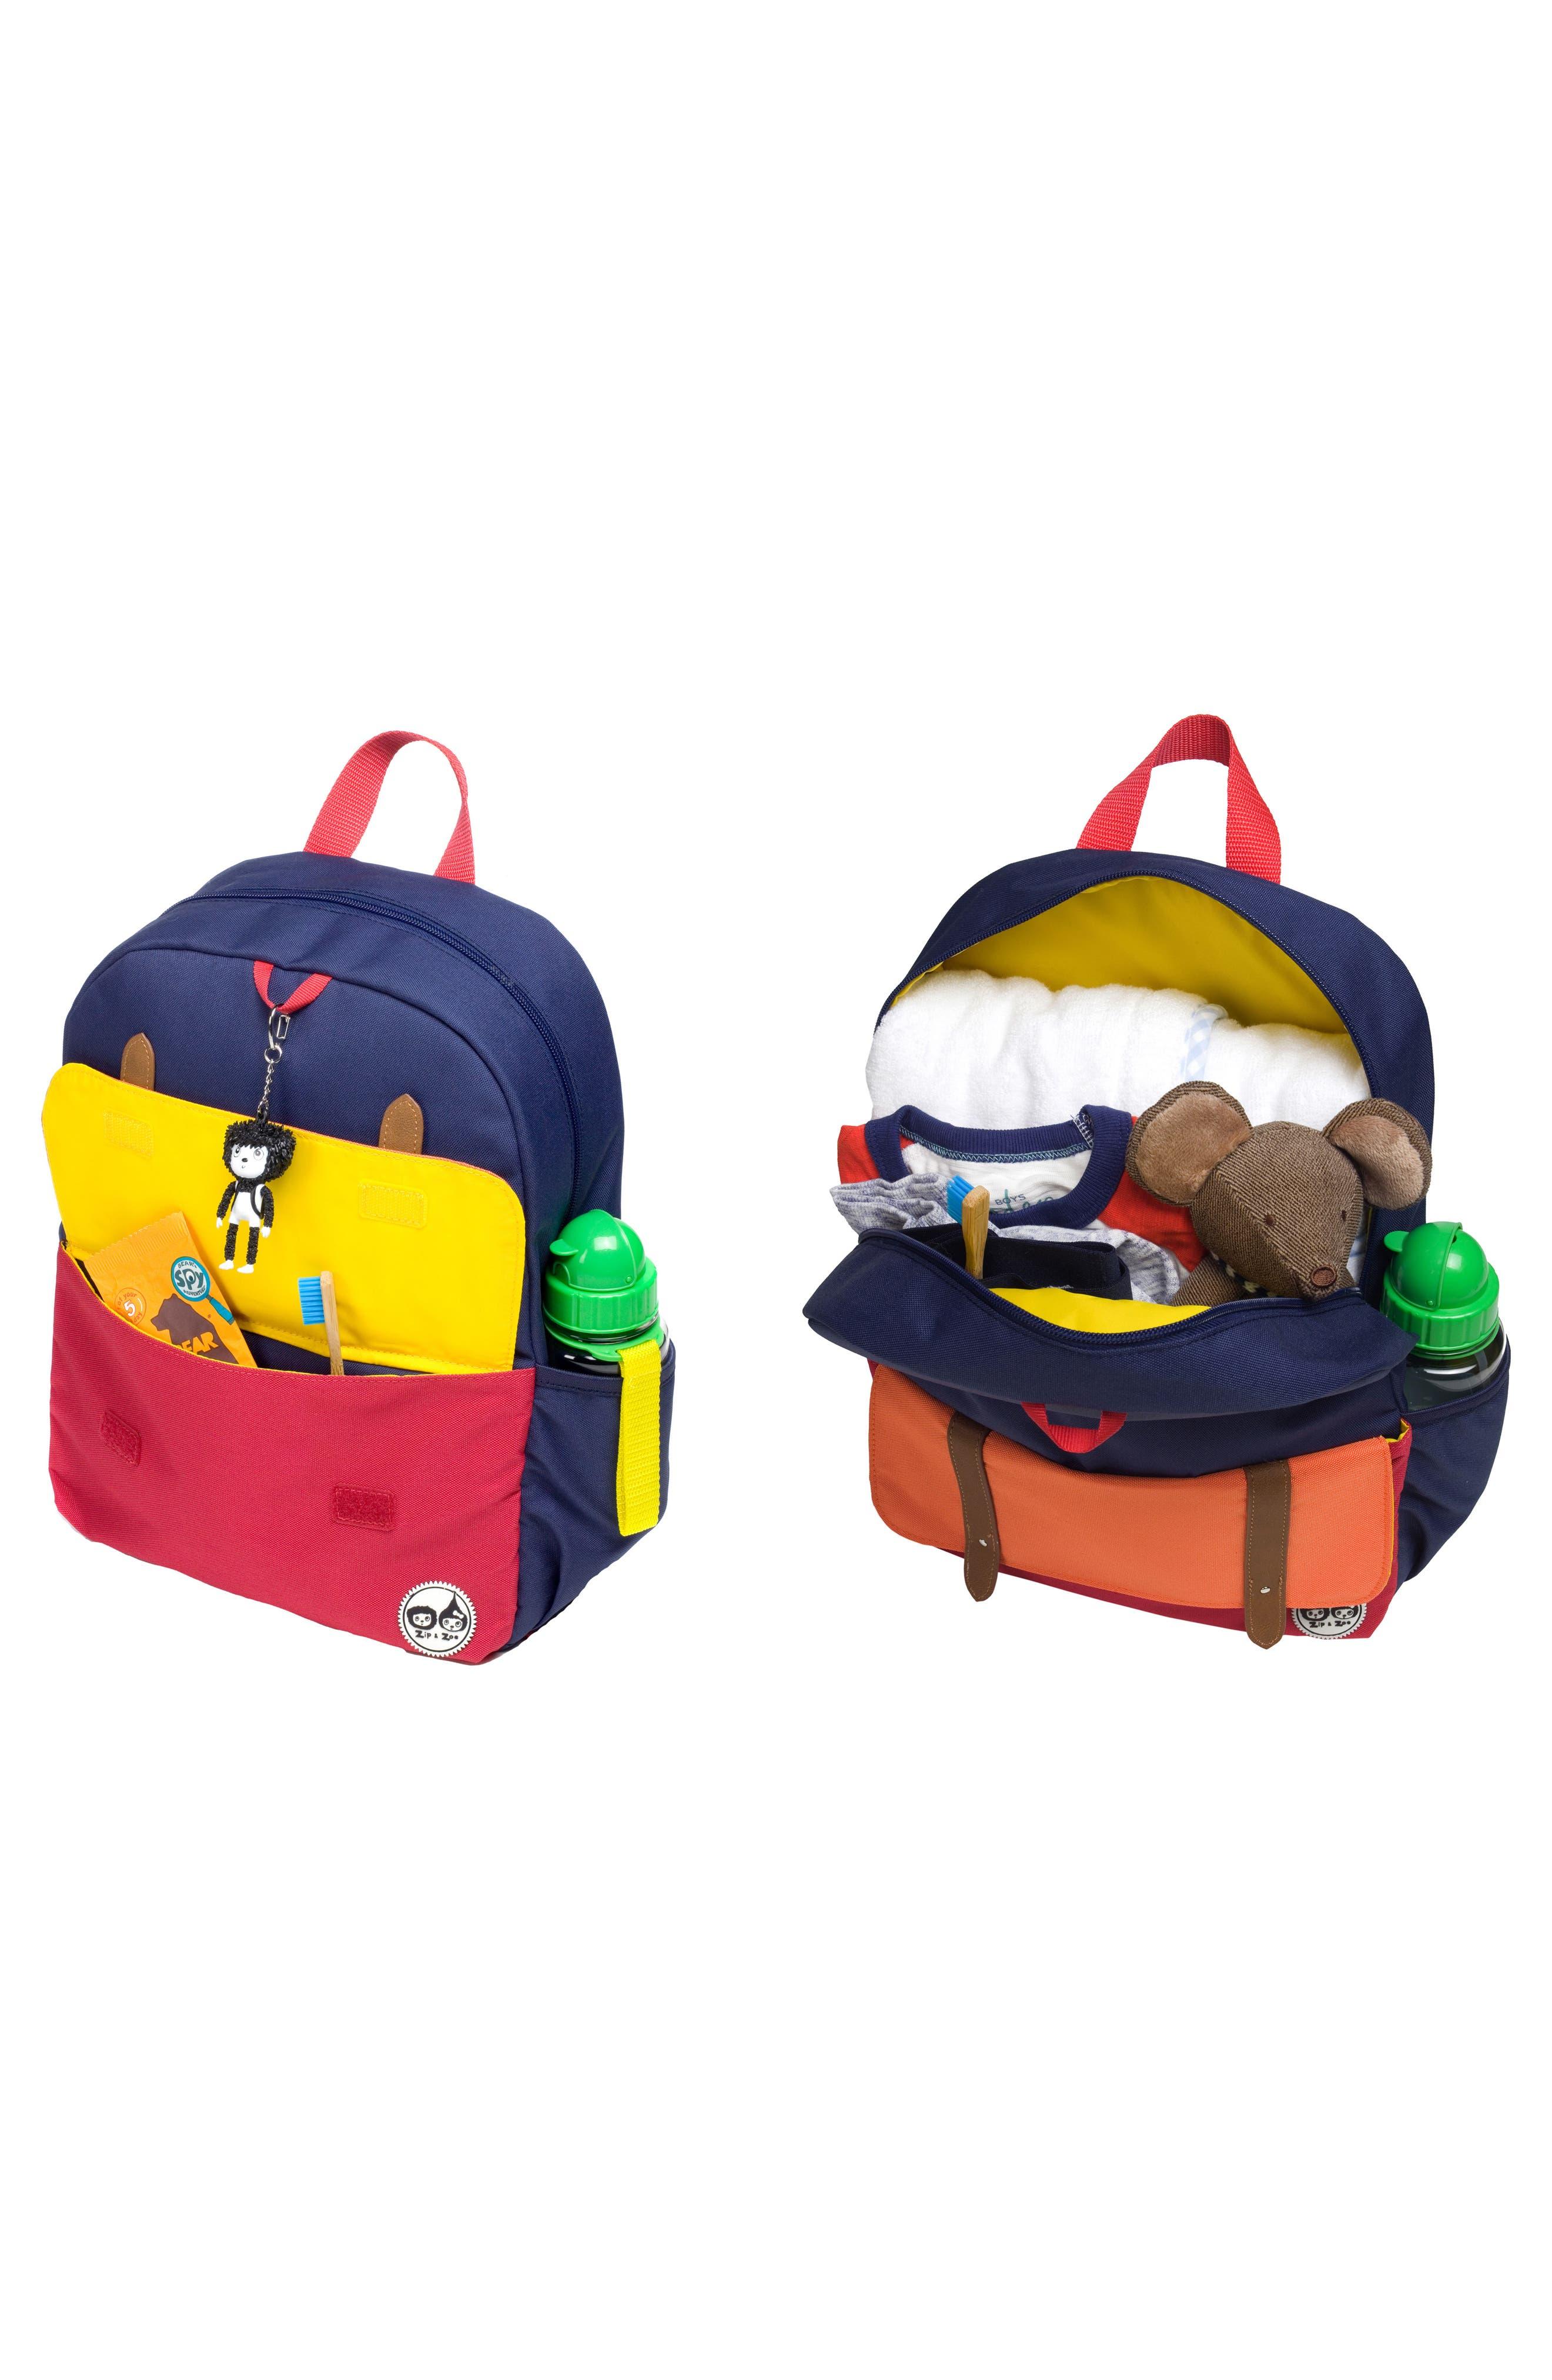 Zip & Zoe Colorblock Junior Backpack,                             Alternate thumbnail 10, color,                             Blue